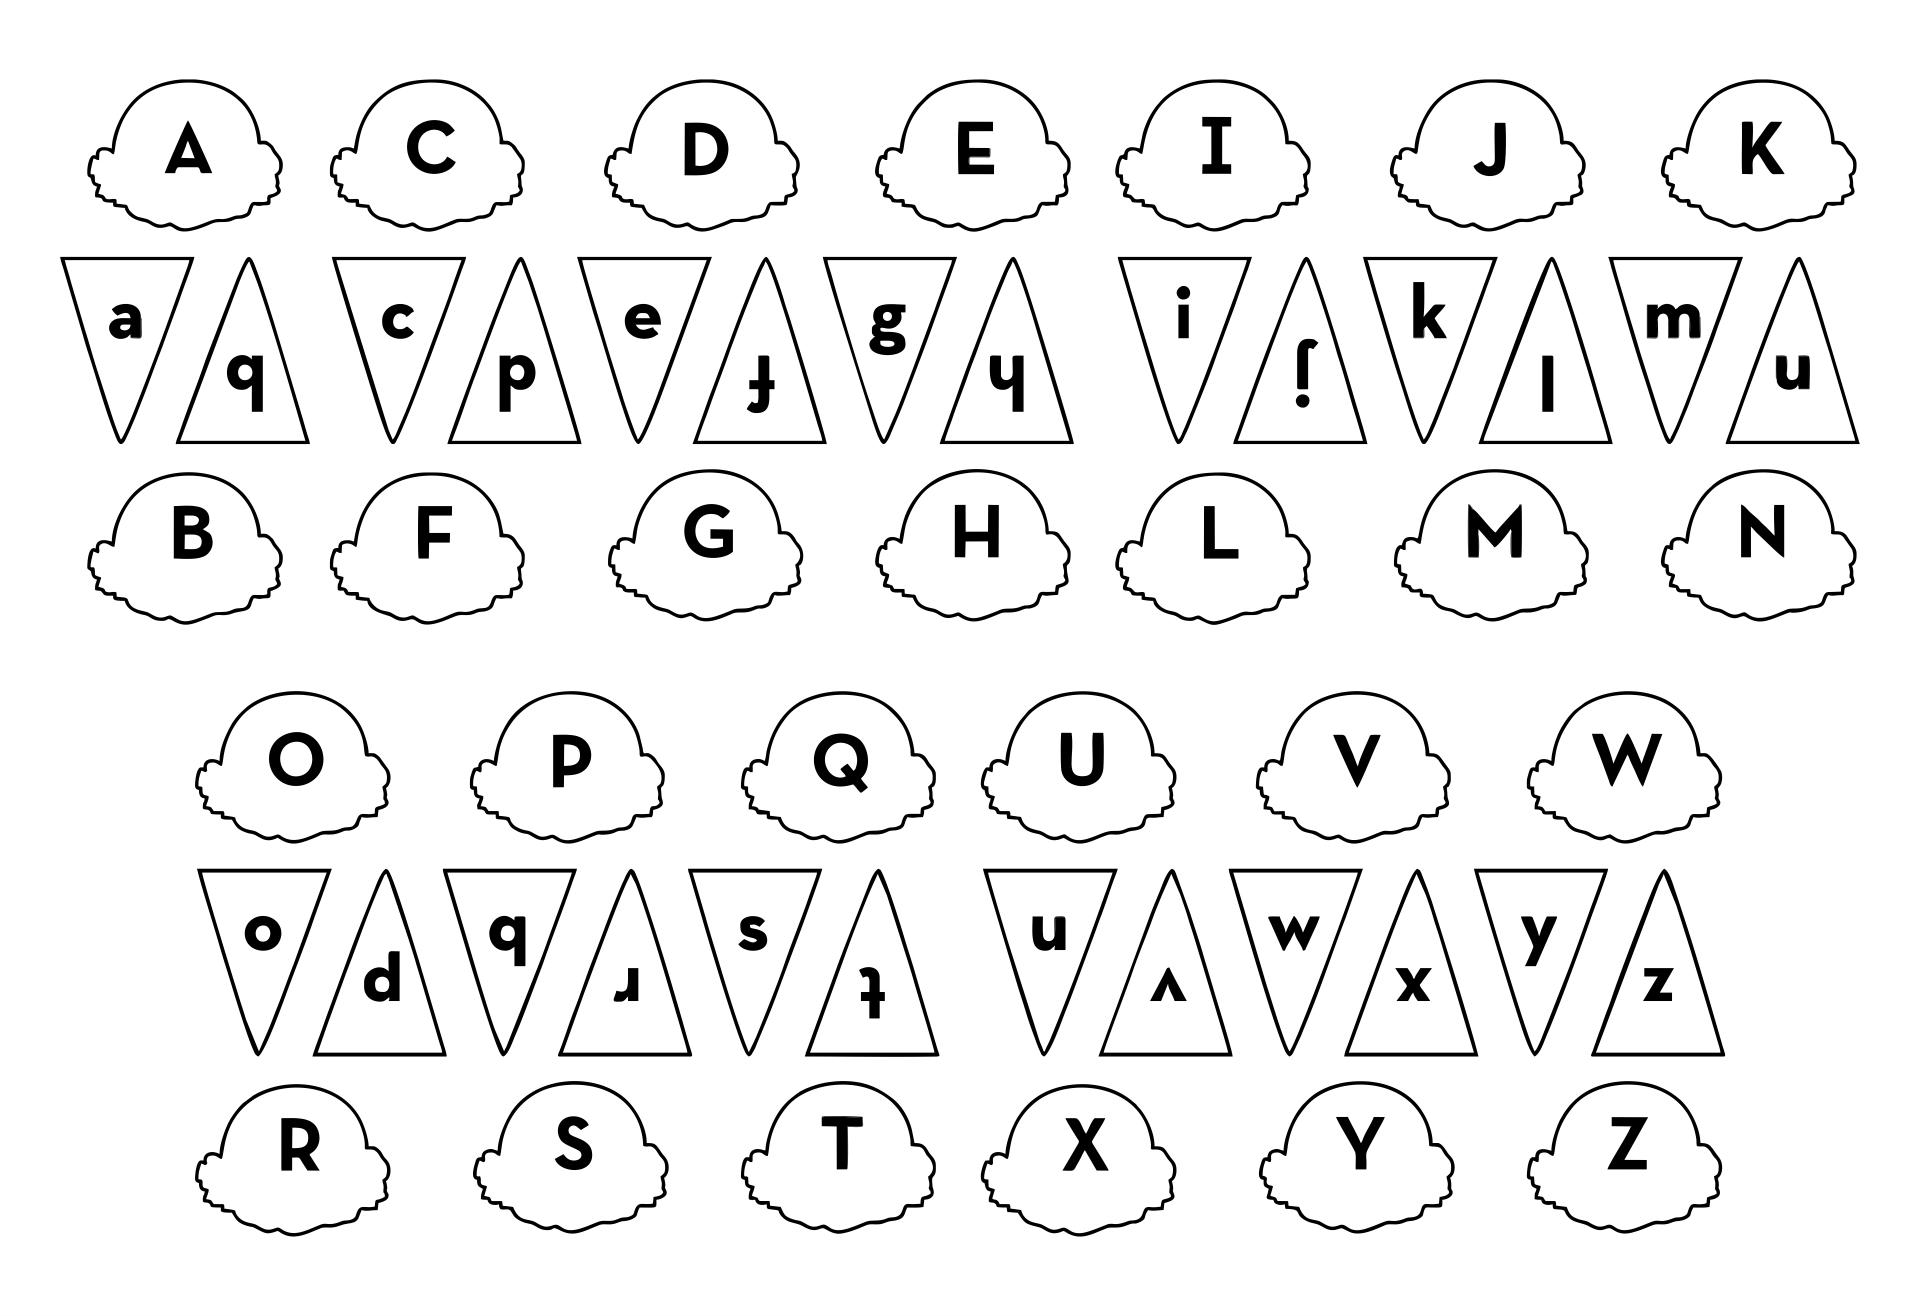 Printable Preschool Alphabet Games for Ice Cream